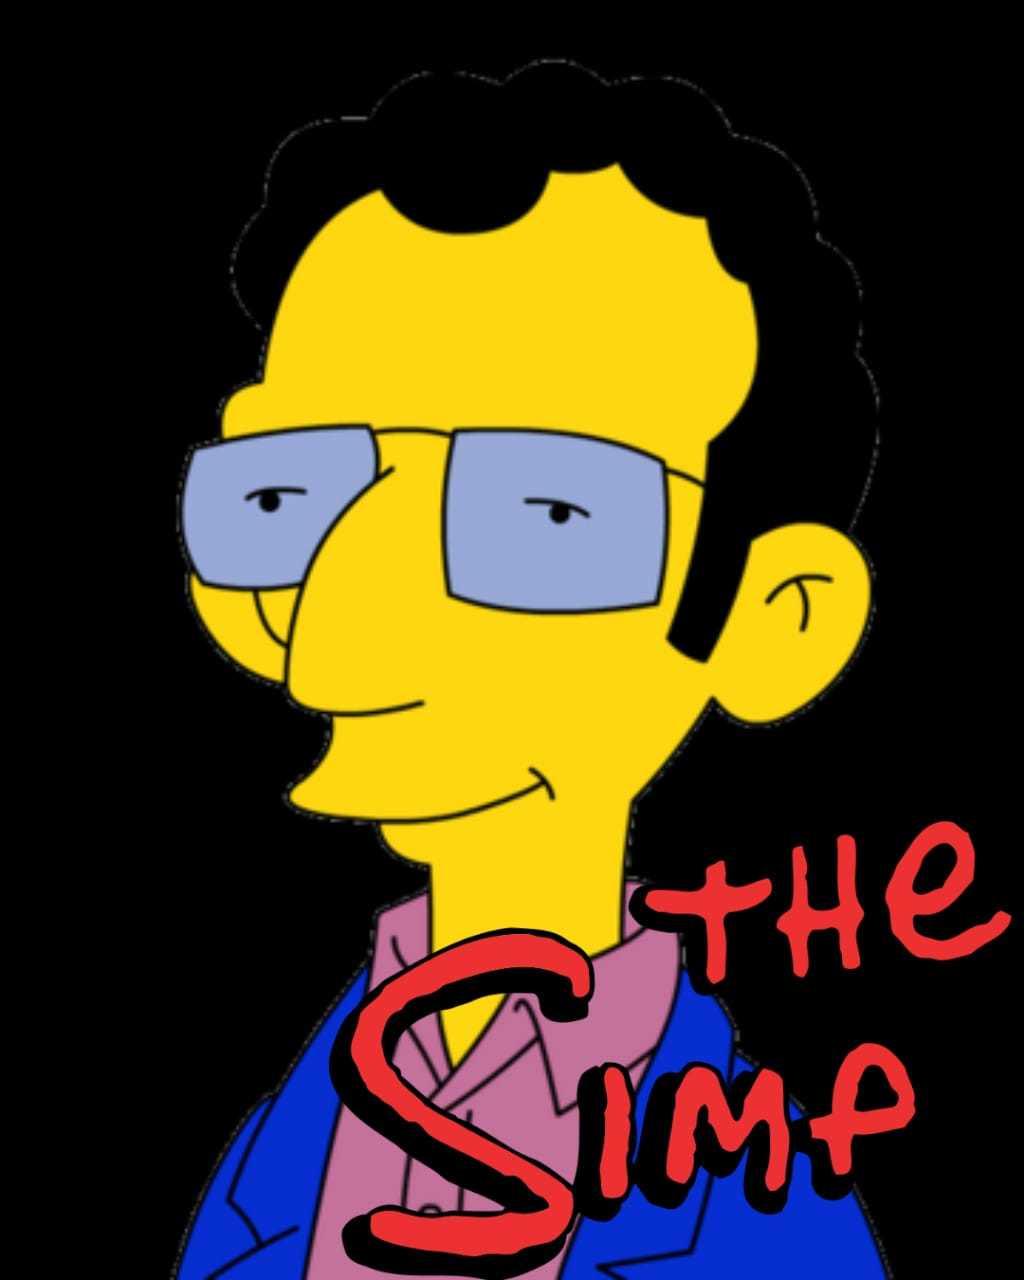 Artie Simp - meme